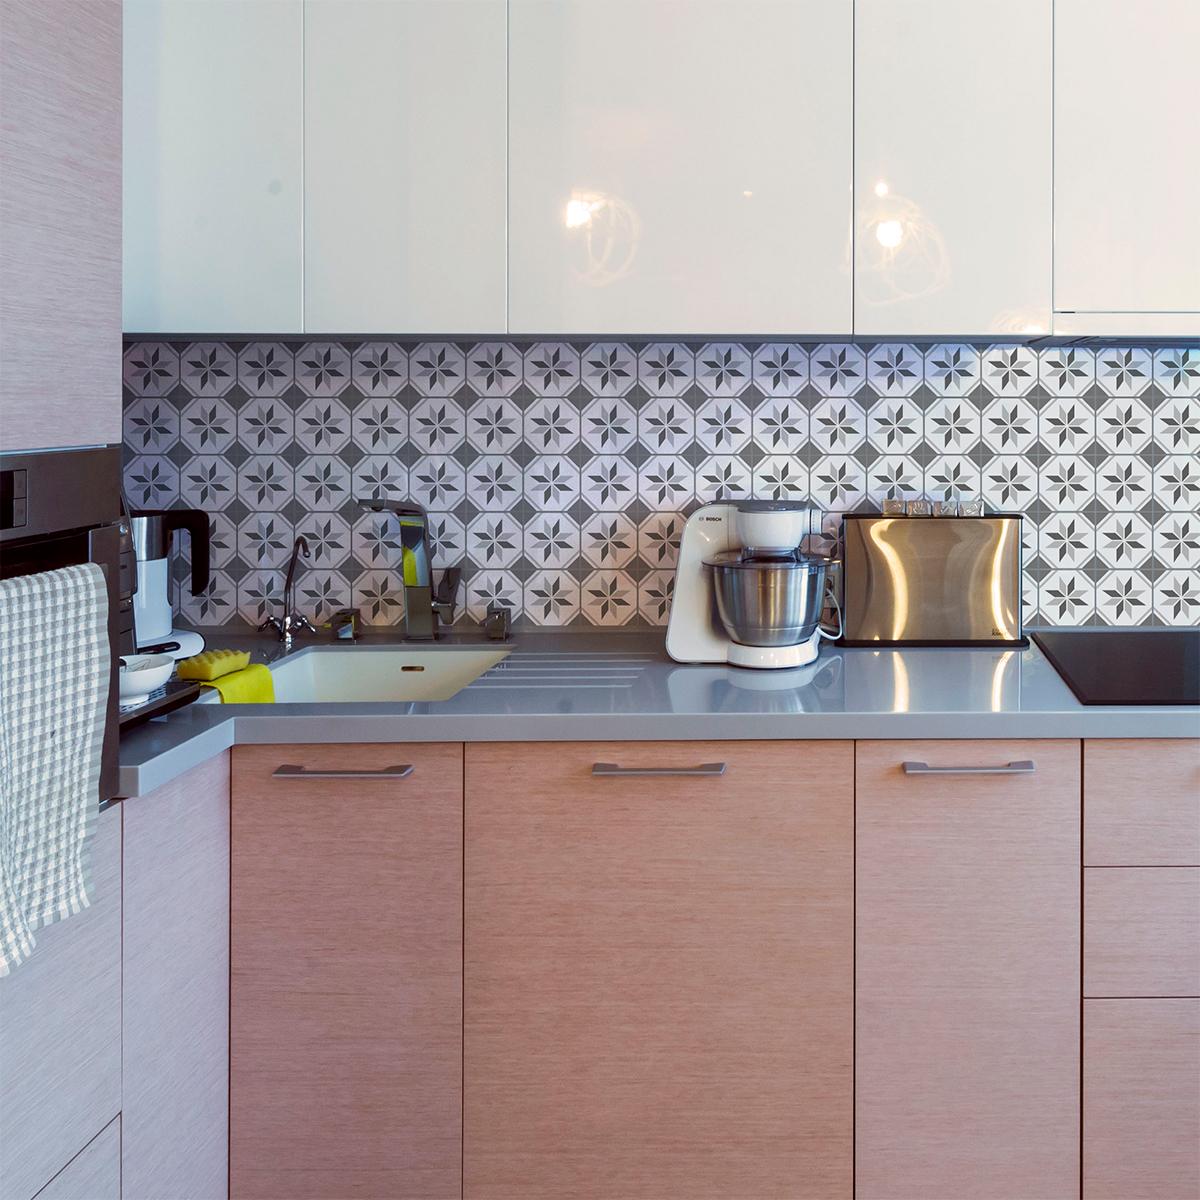 30 stickers carreaux de ciment azulejos isia cuisine. Black Bedroom Furniture Sets. Home Design Ideas